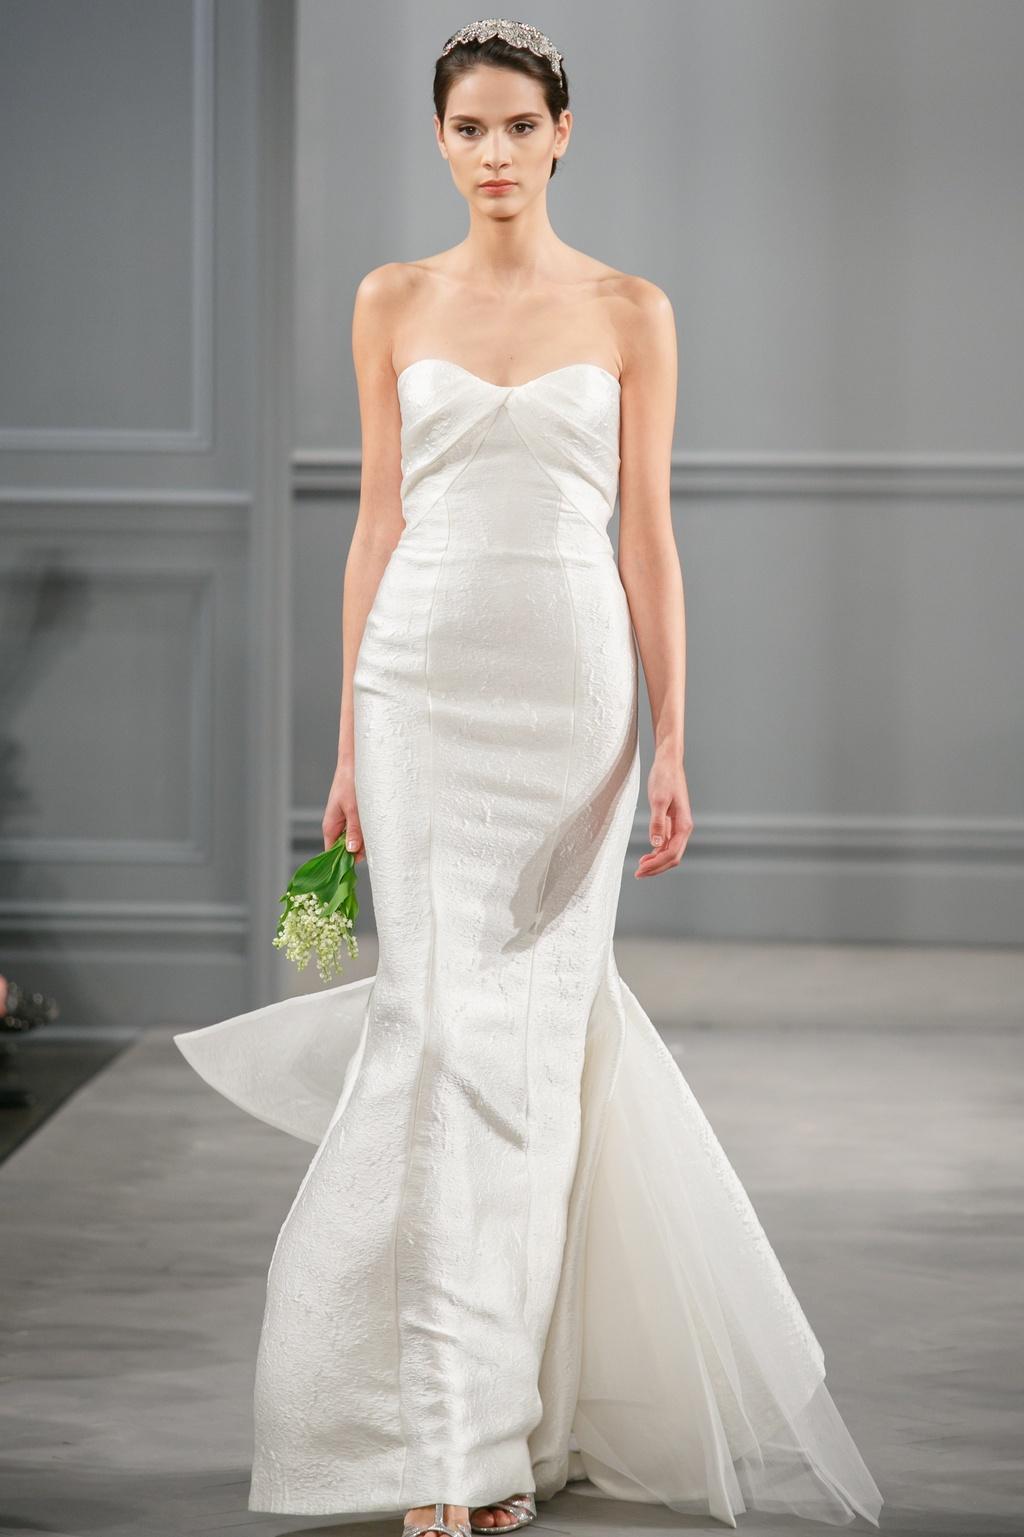 Spring-2014-wedding-dress-monique-lhuillier-bridal-isla.full